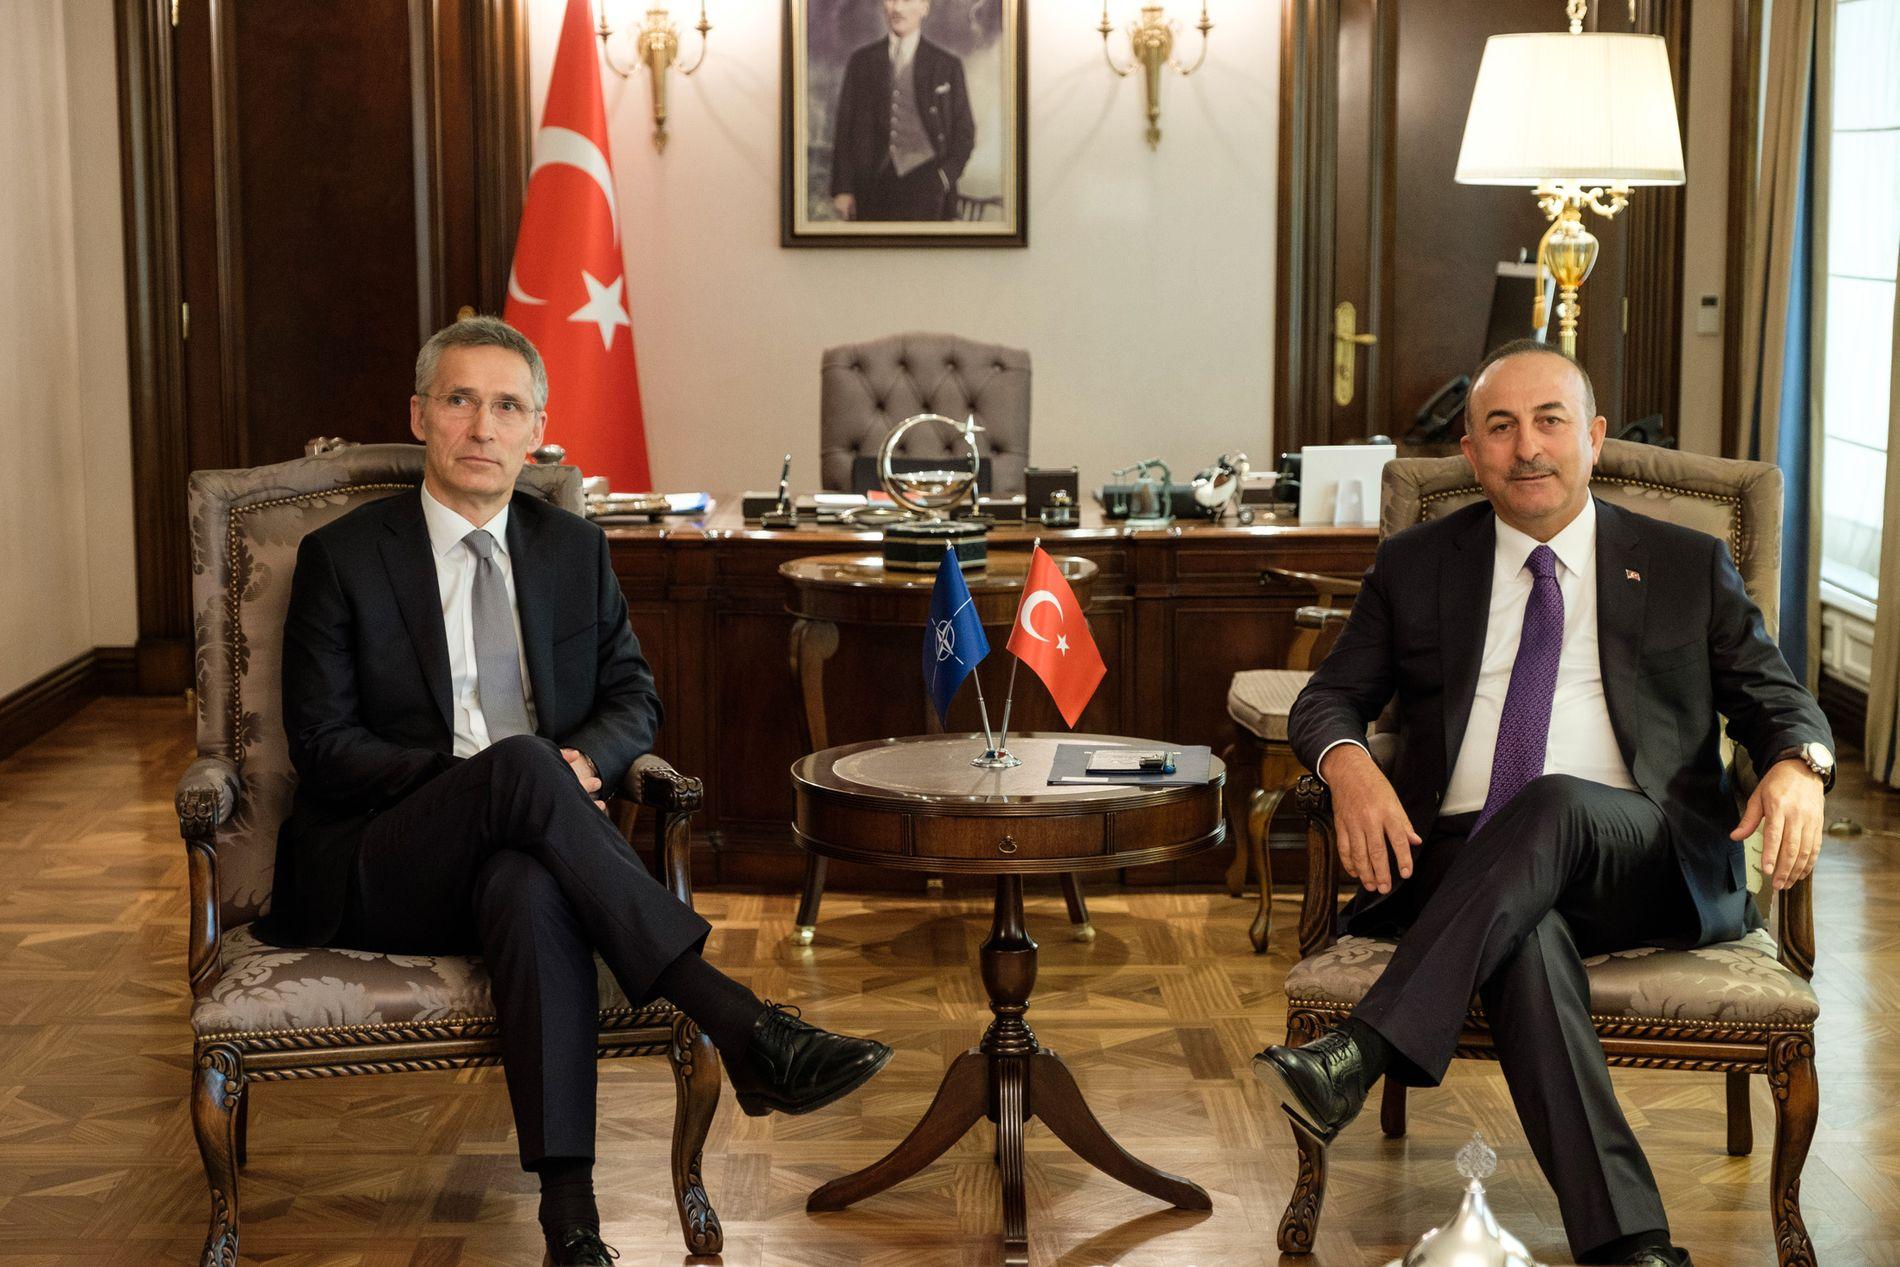 SAMTALER: NATOs generalsekretær Jens Stoltenberg møtte Tyrkias utenriksminister Mevlut Cavasoglu i Ankara mandag.